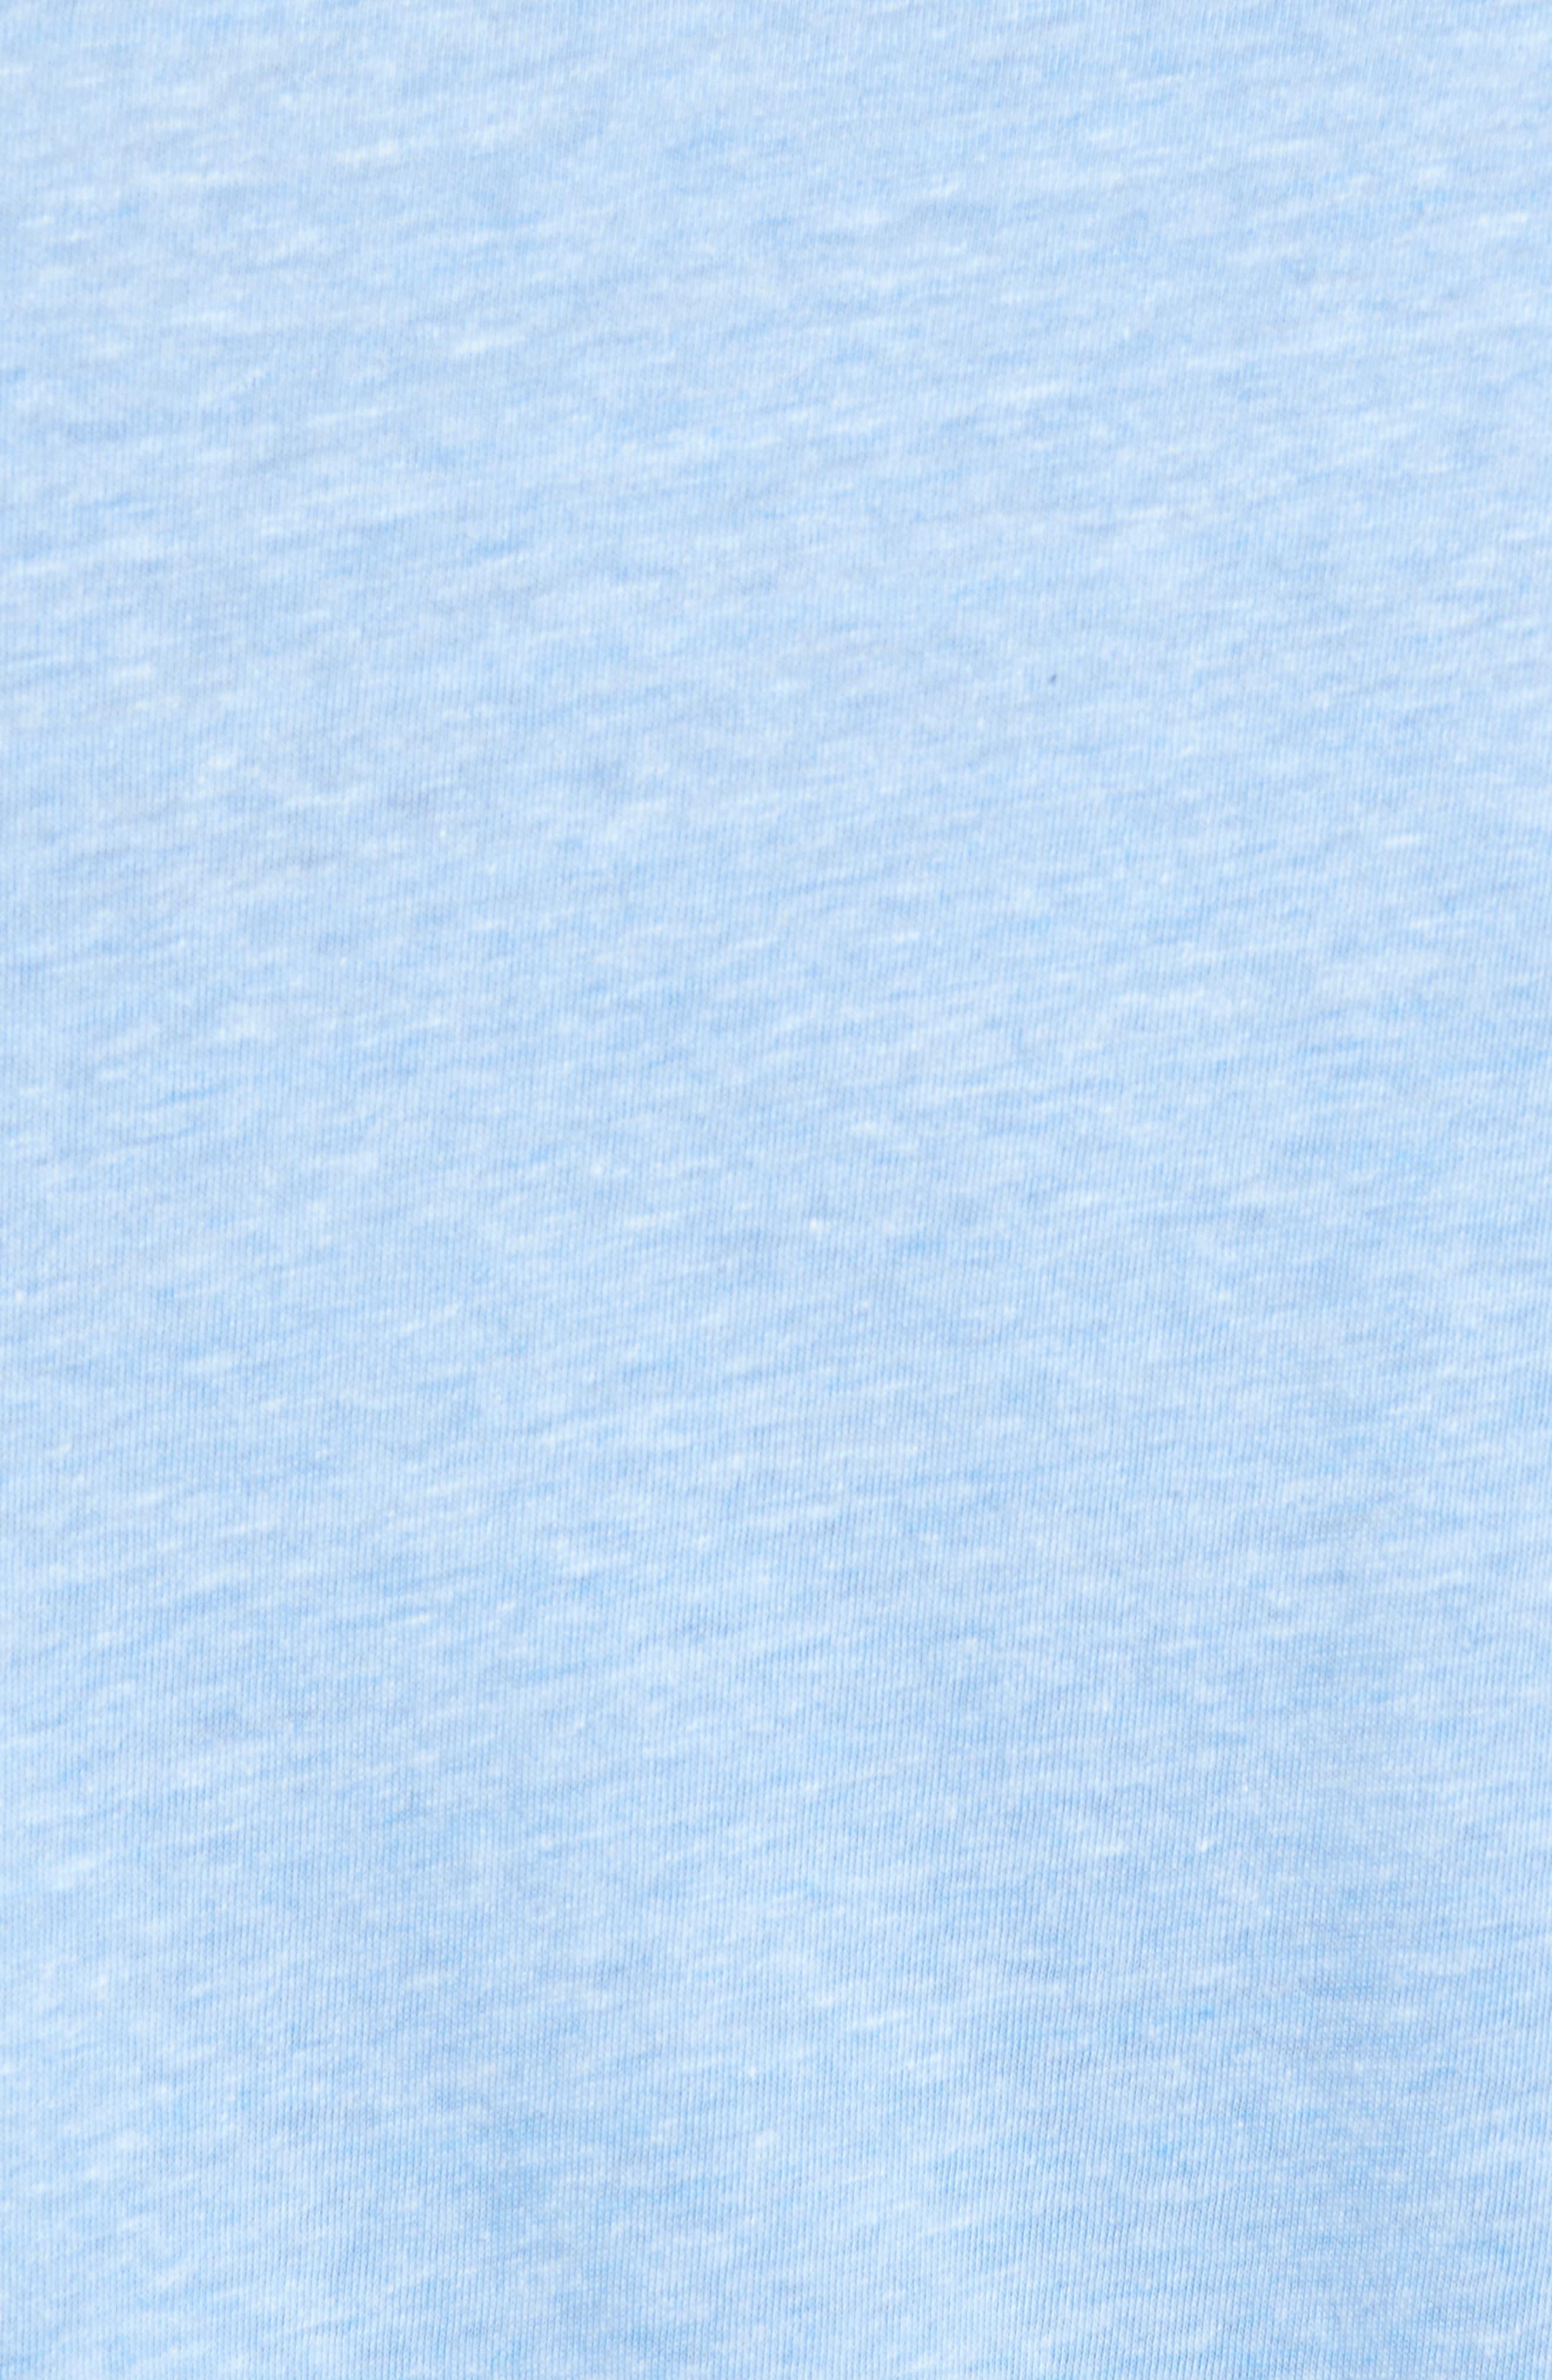 Reel Life Graphic T-Shirt,                             Alternate thumbnail 5, color,                             Dusty Blue